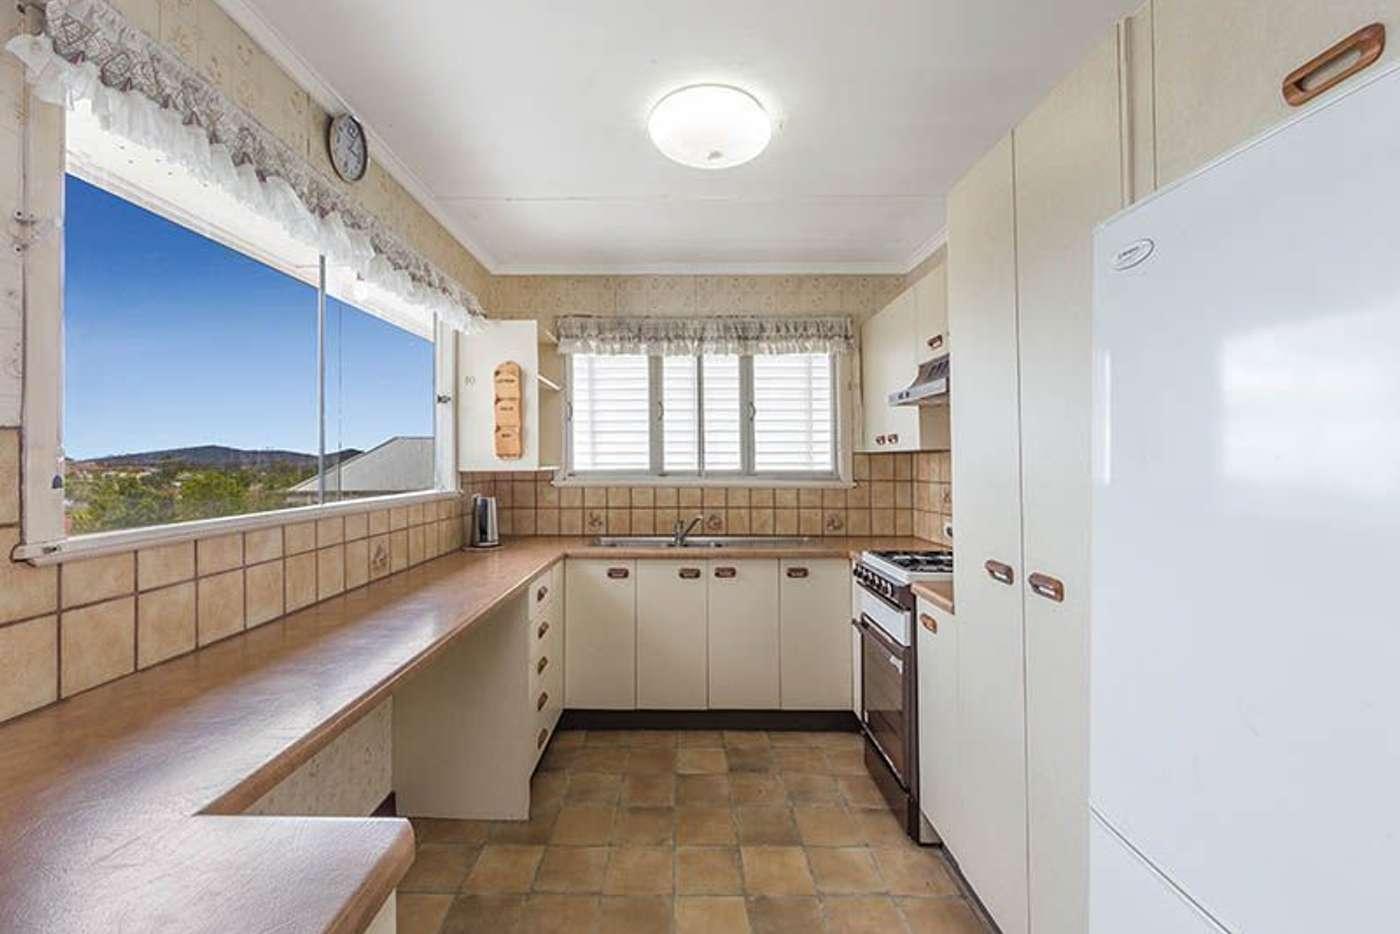 Sixth view of Homely house listing, 139 Wanda Road, Upper Mount Gravatt QLD 4122